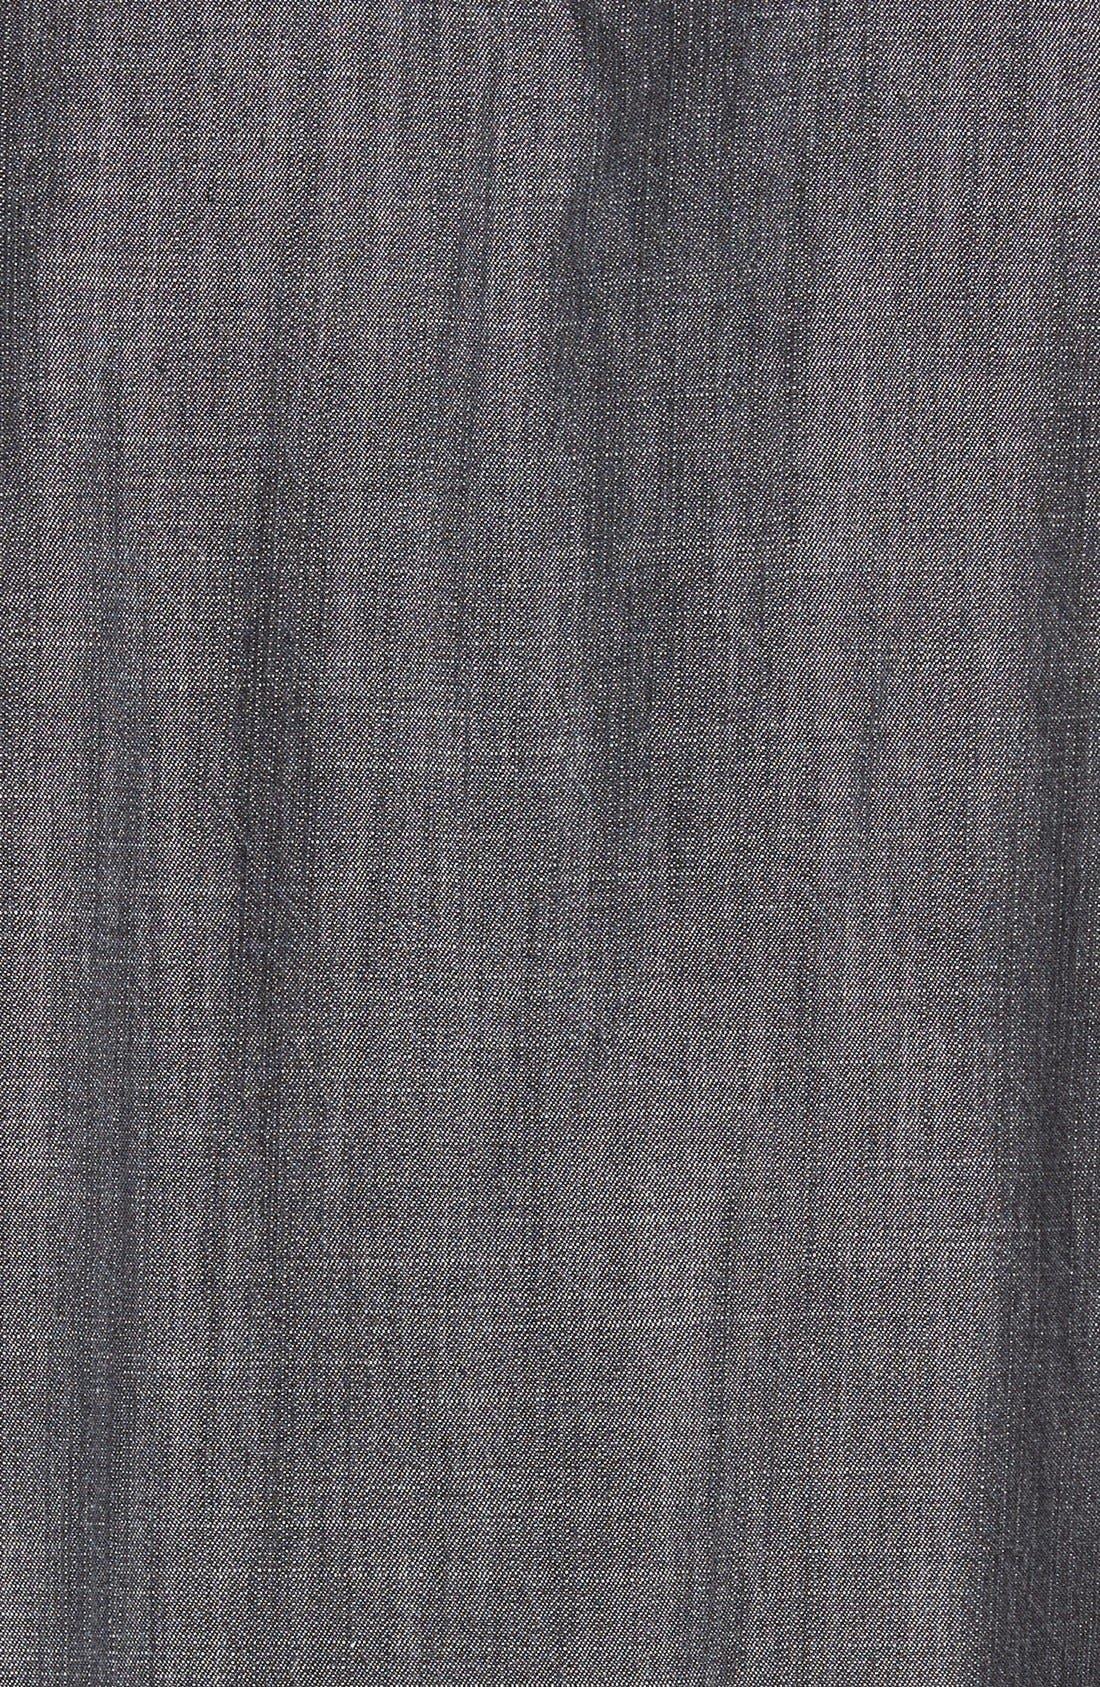 Gathered Chambray Skirt,                             Alternate thumbnail 3, color,                             001